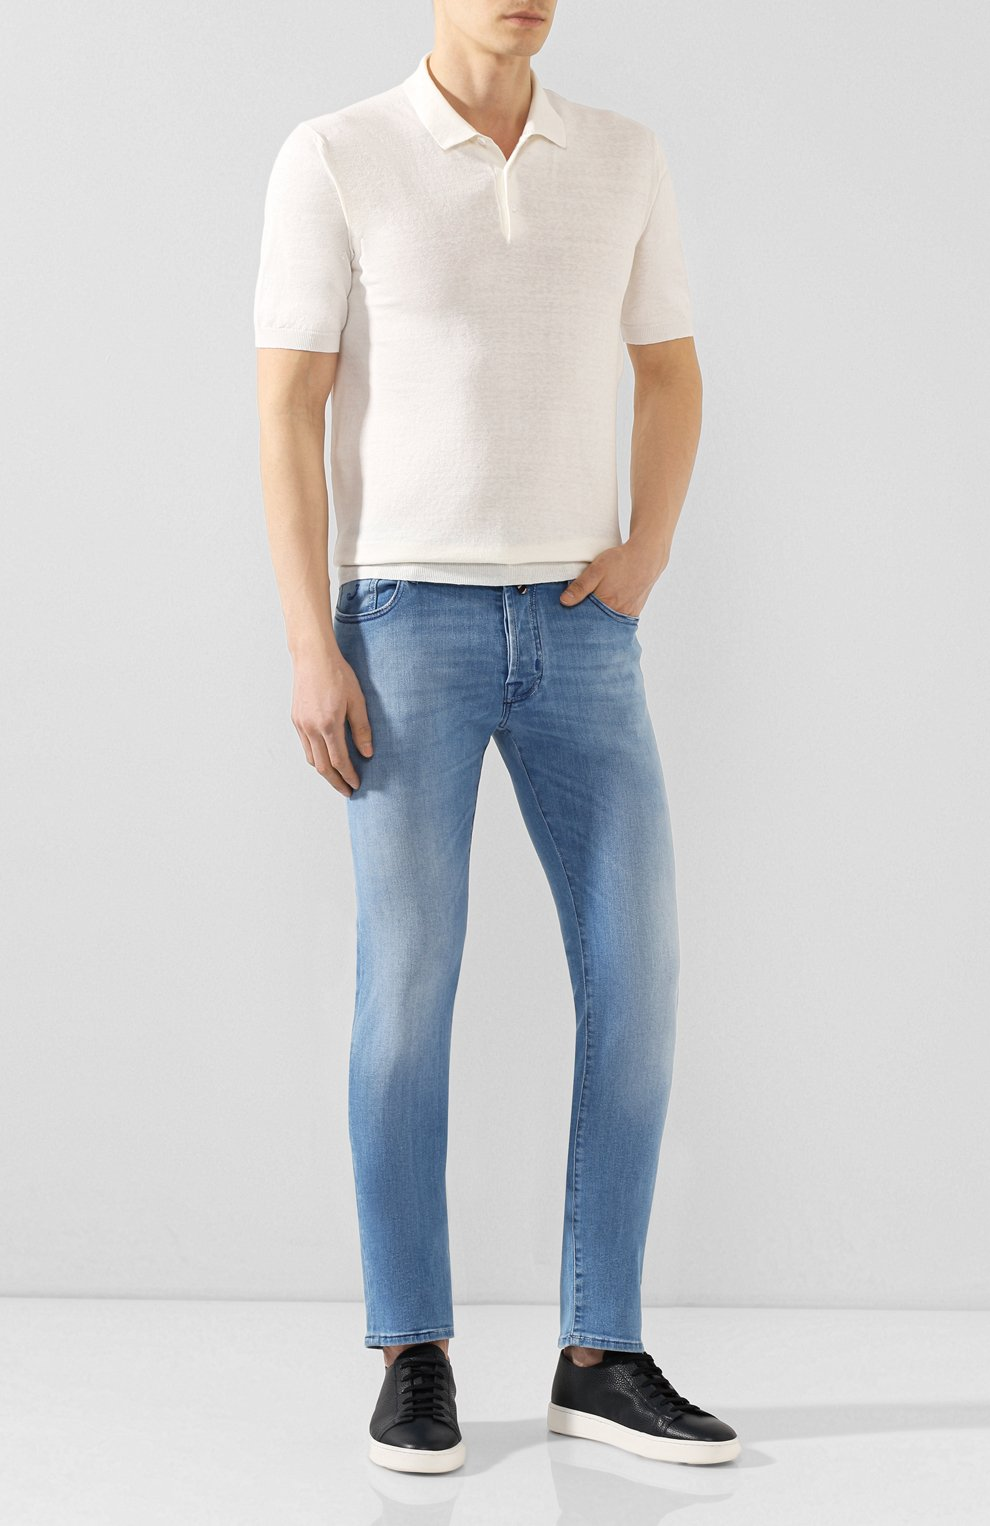 Мужские джинсы JACOB COHEN голубого цвета, арт. J688 C0MF 01855-W3/53 | Фото 2